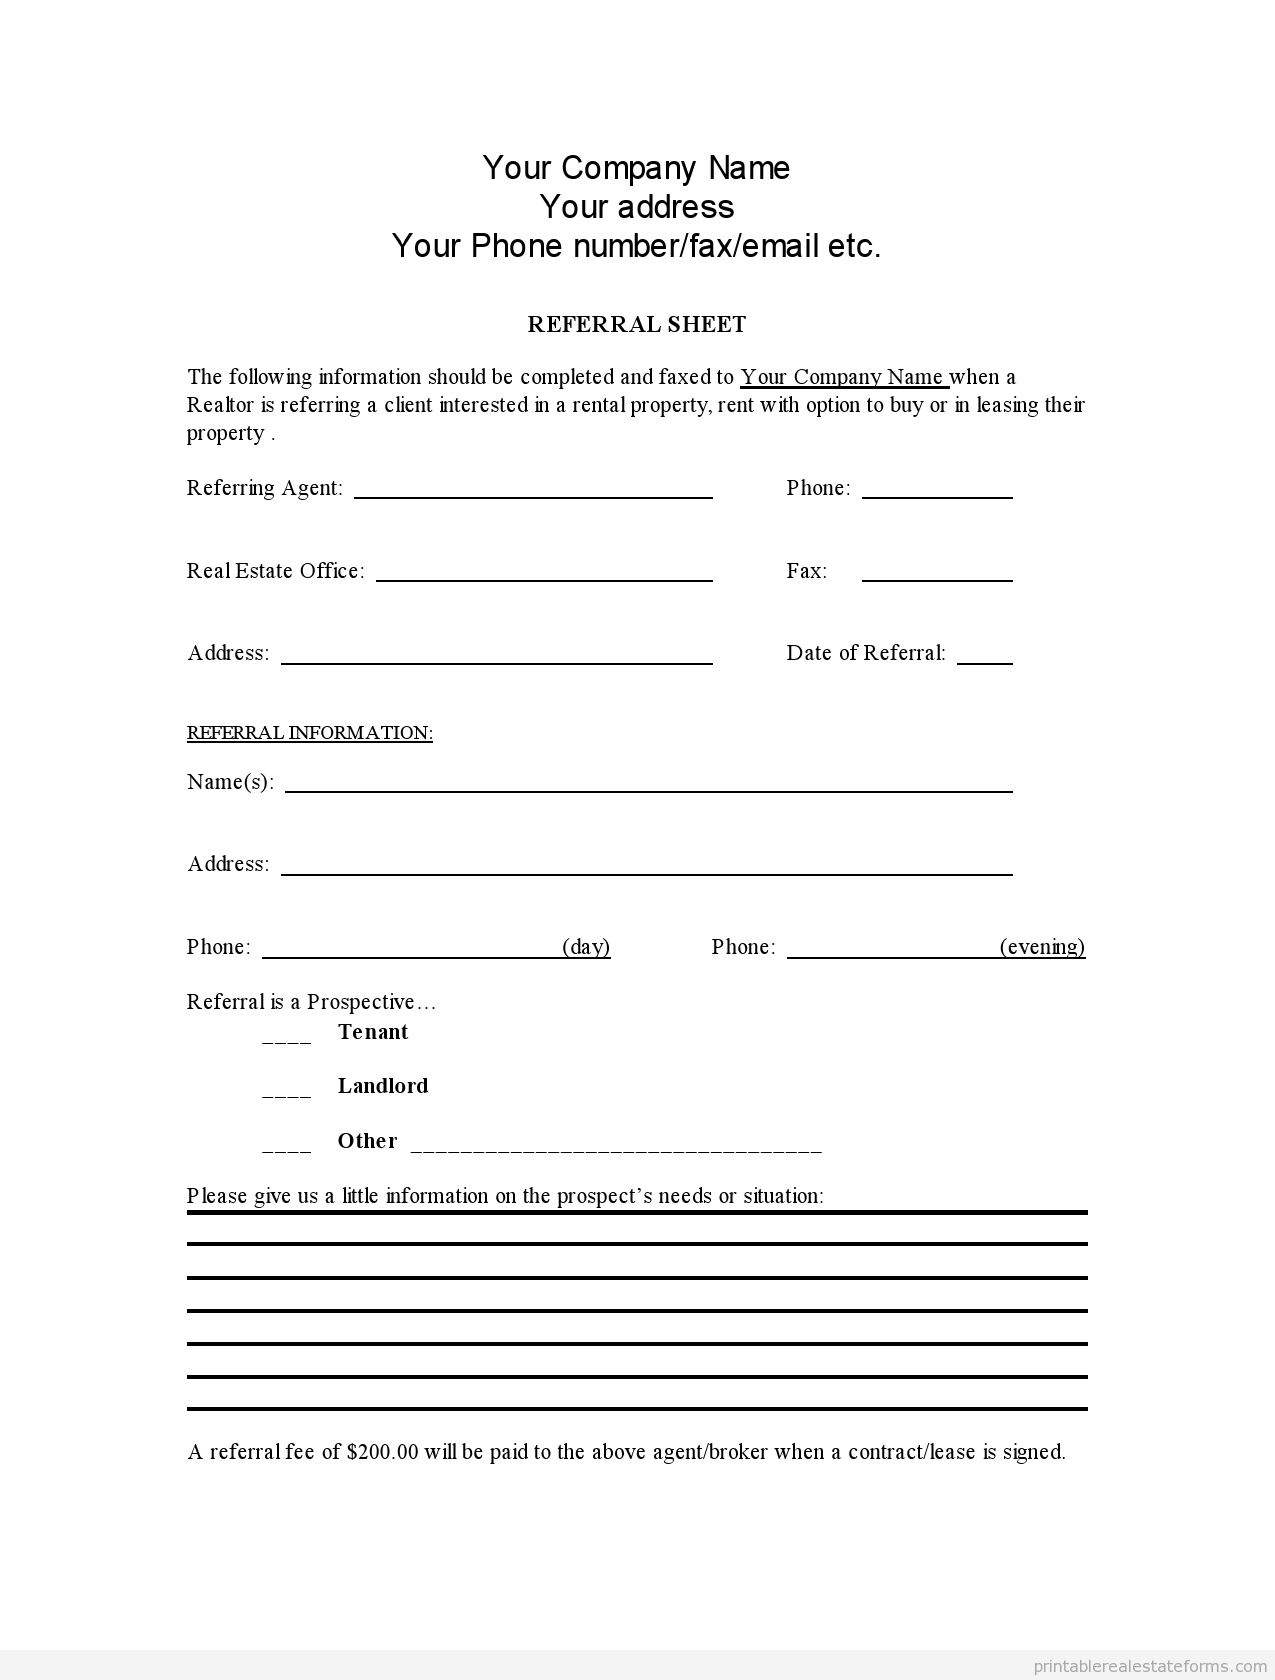 Sample Printable referral sheet for realtors Form | Latest Sample ...